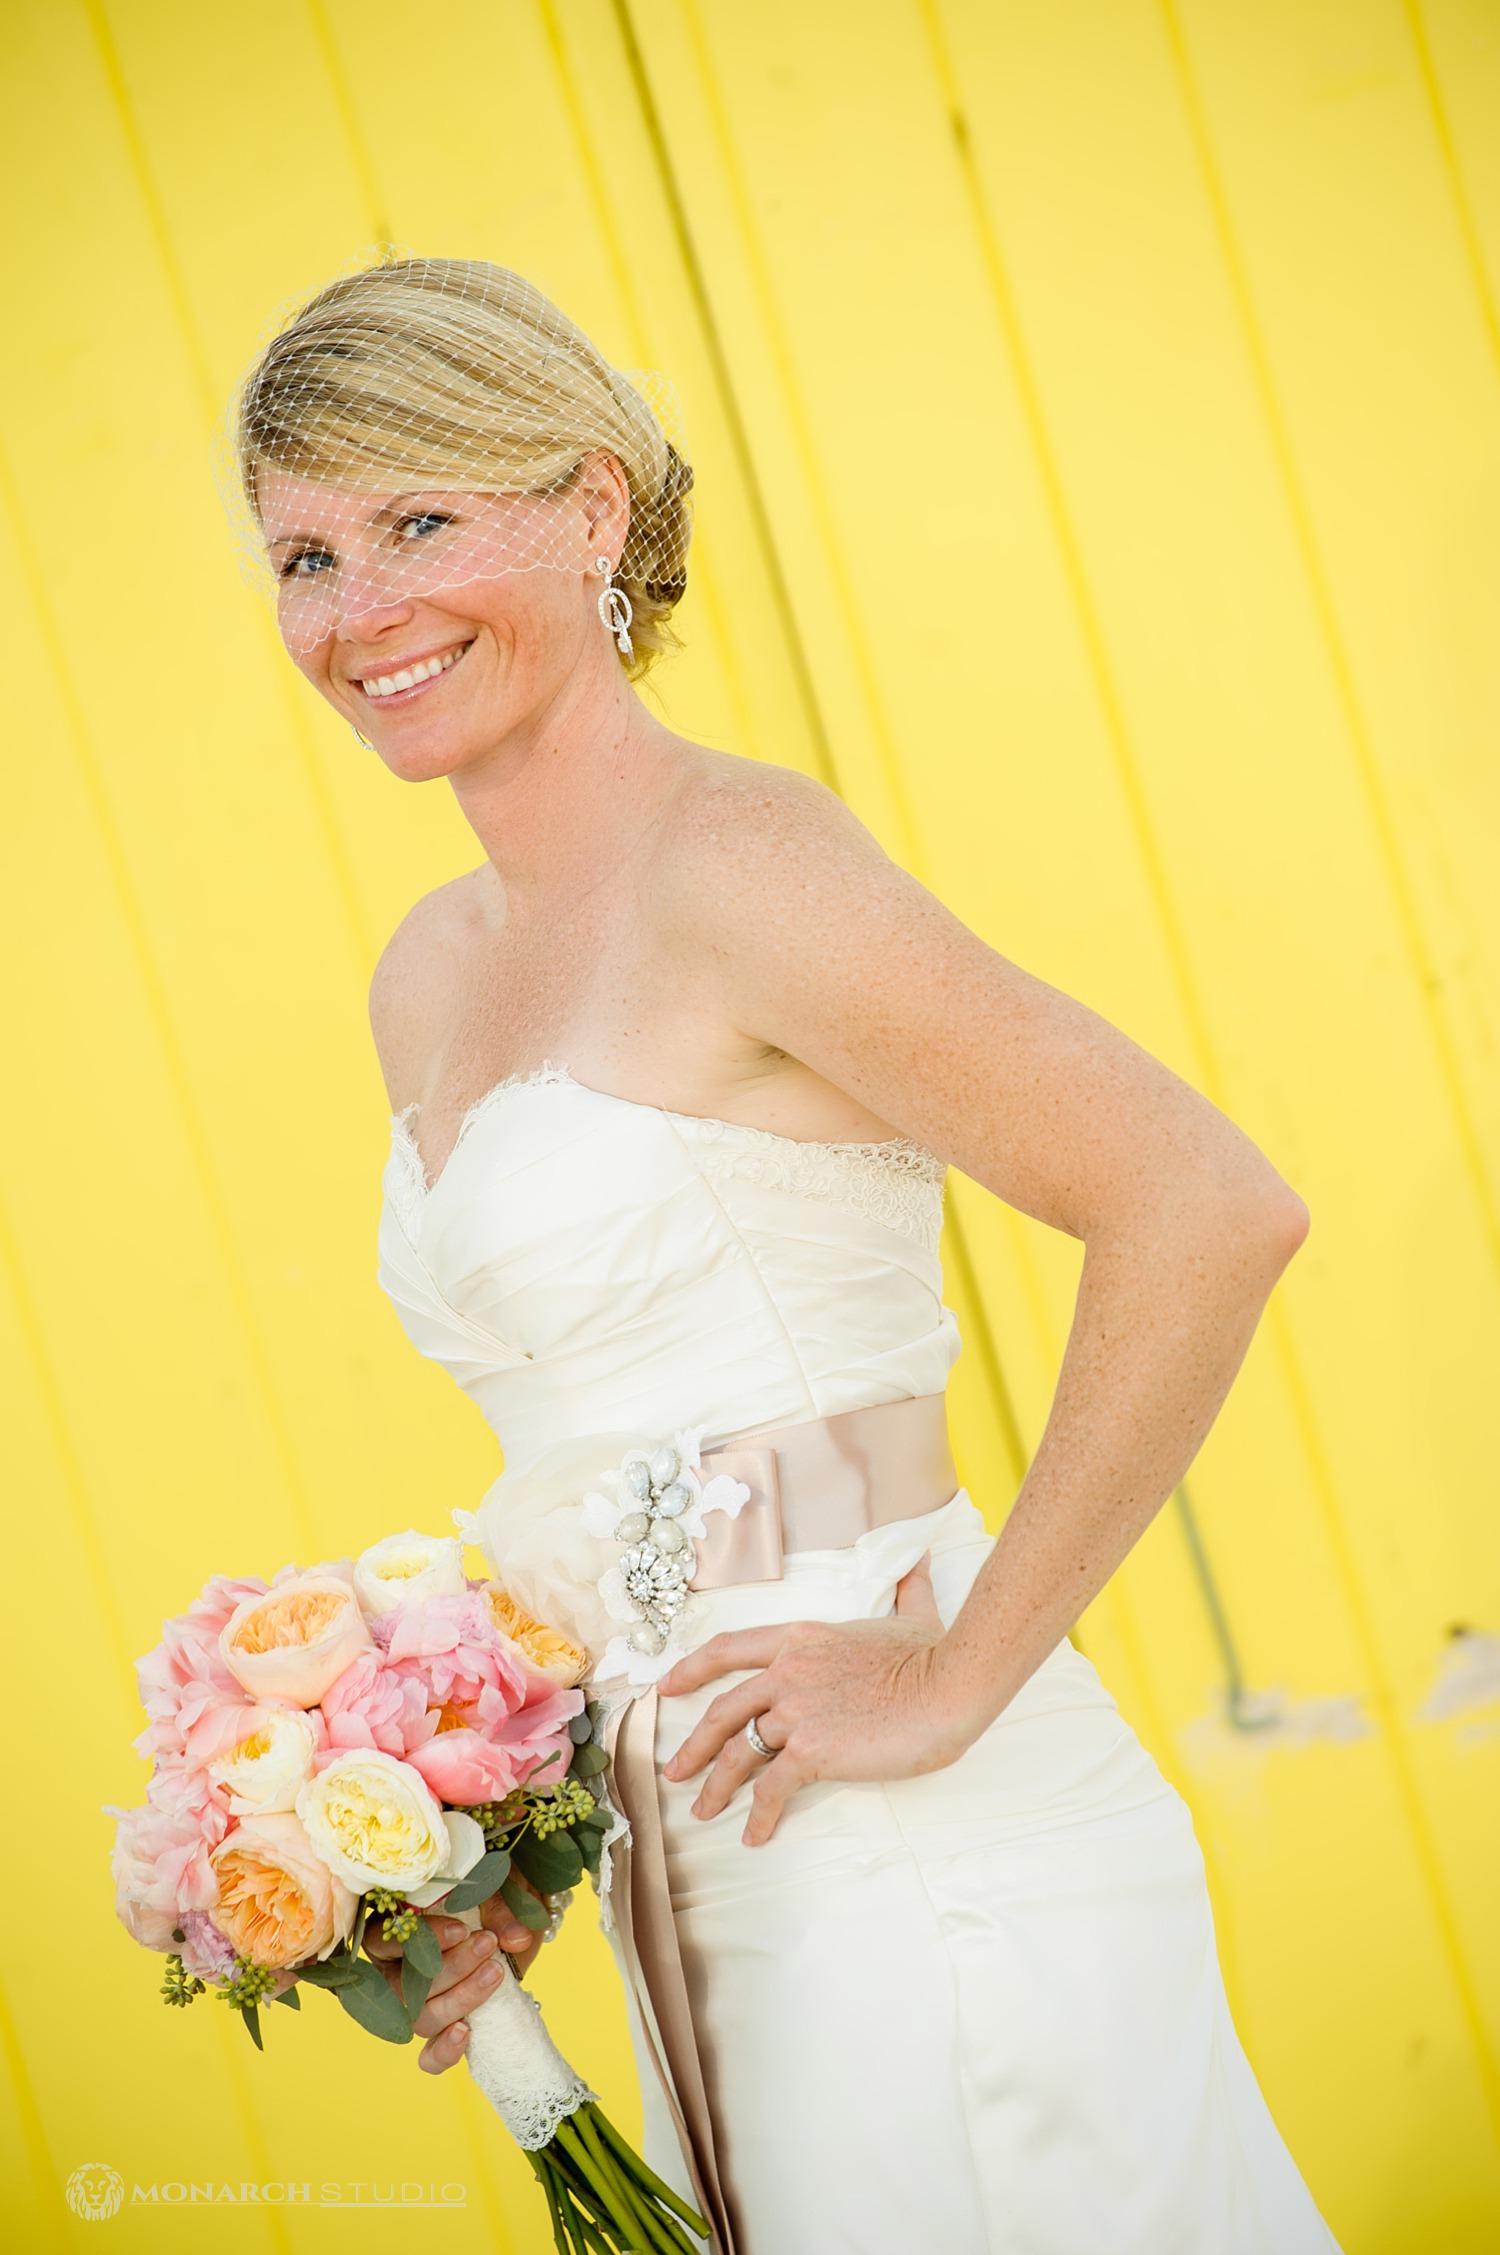 Bride Portrait in Hope Town Bahamas by Monarch Studio Wedding Photographer